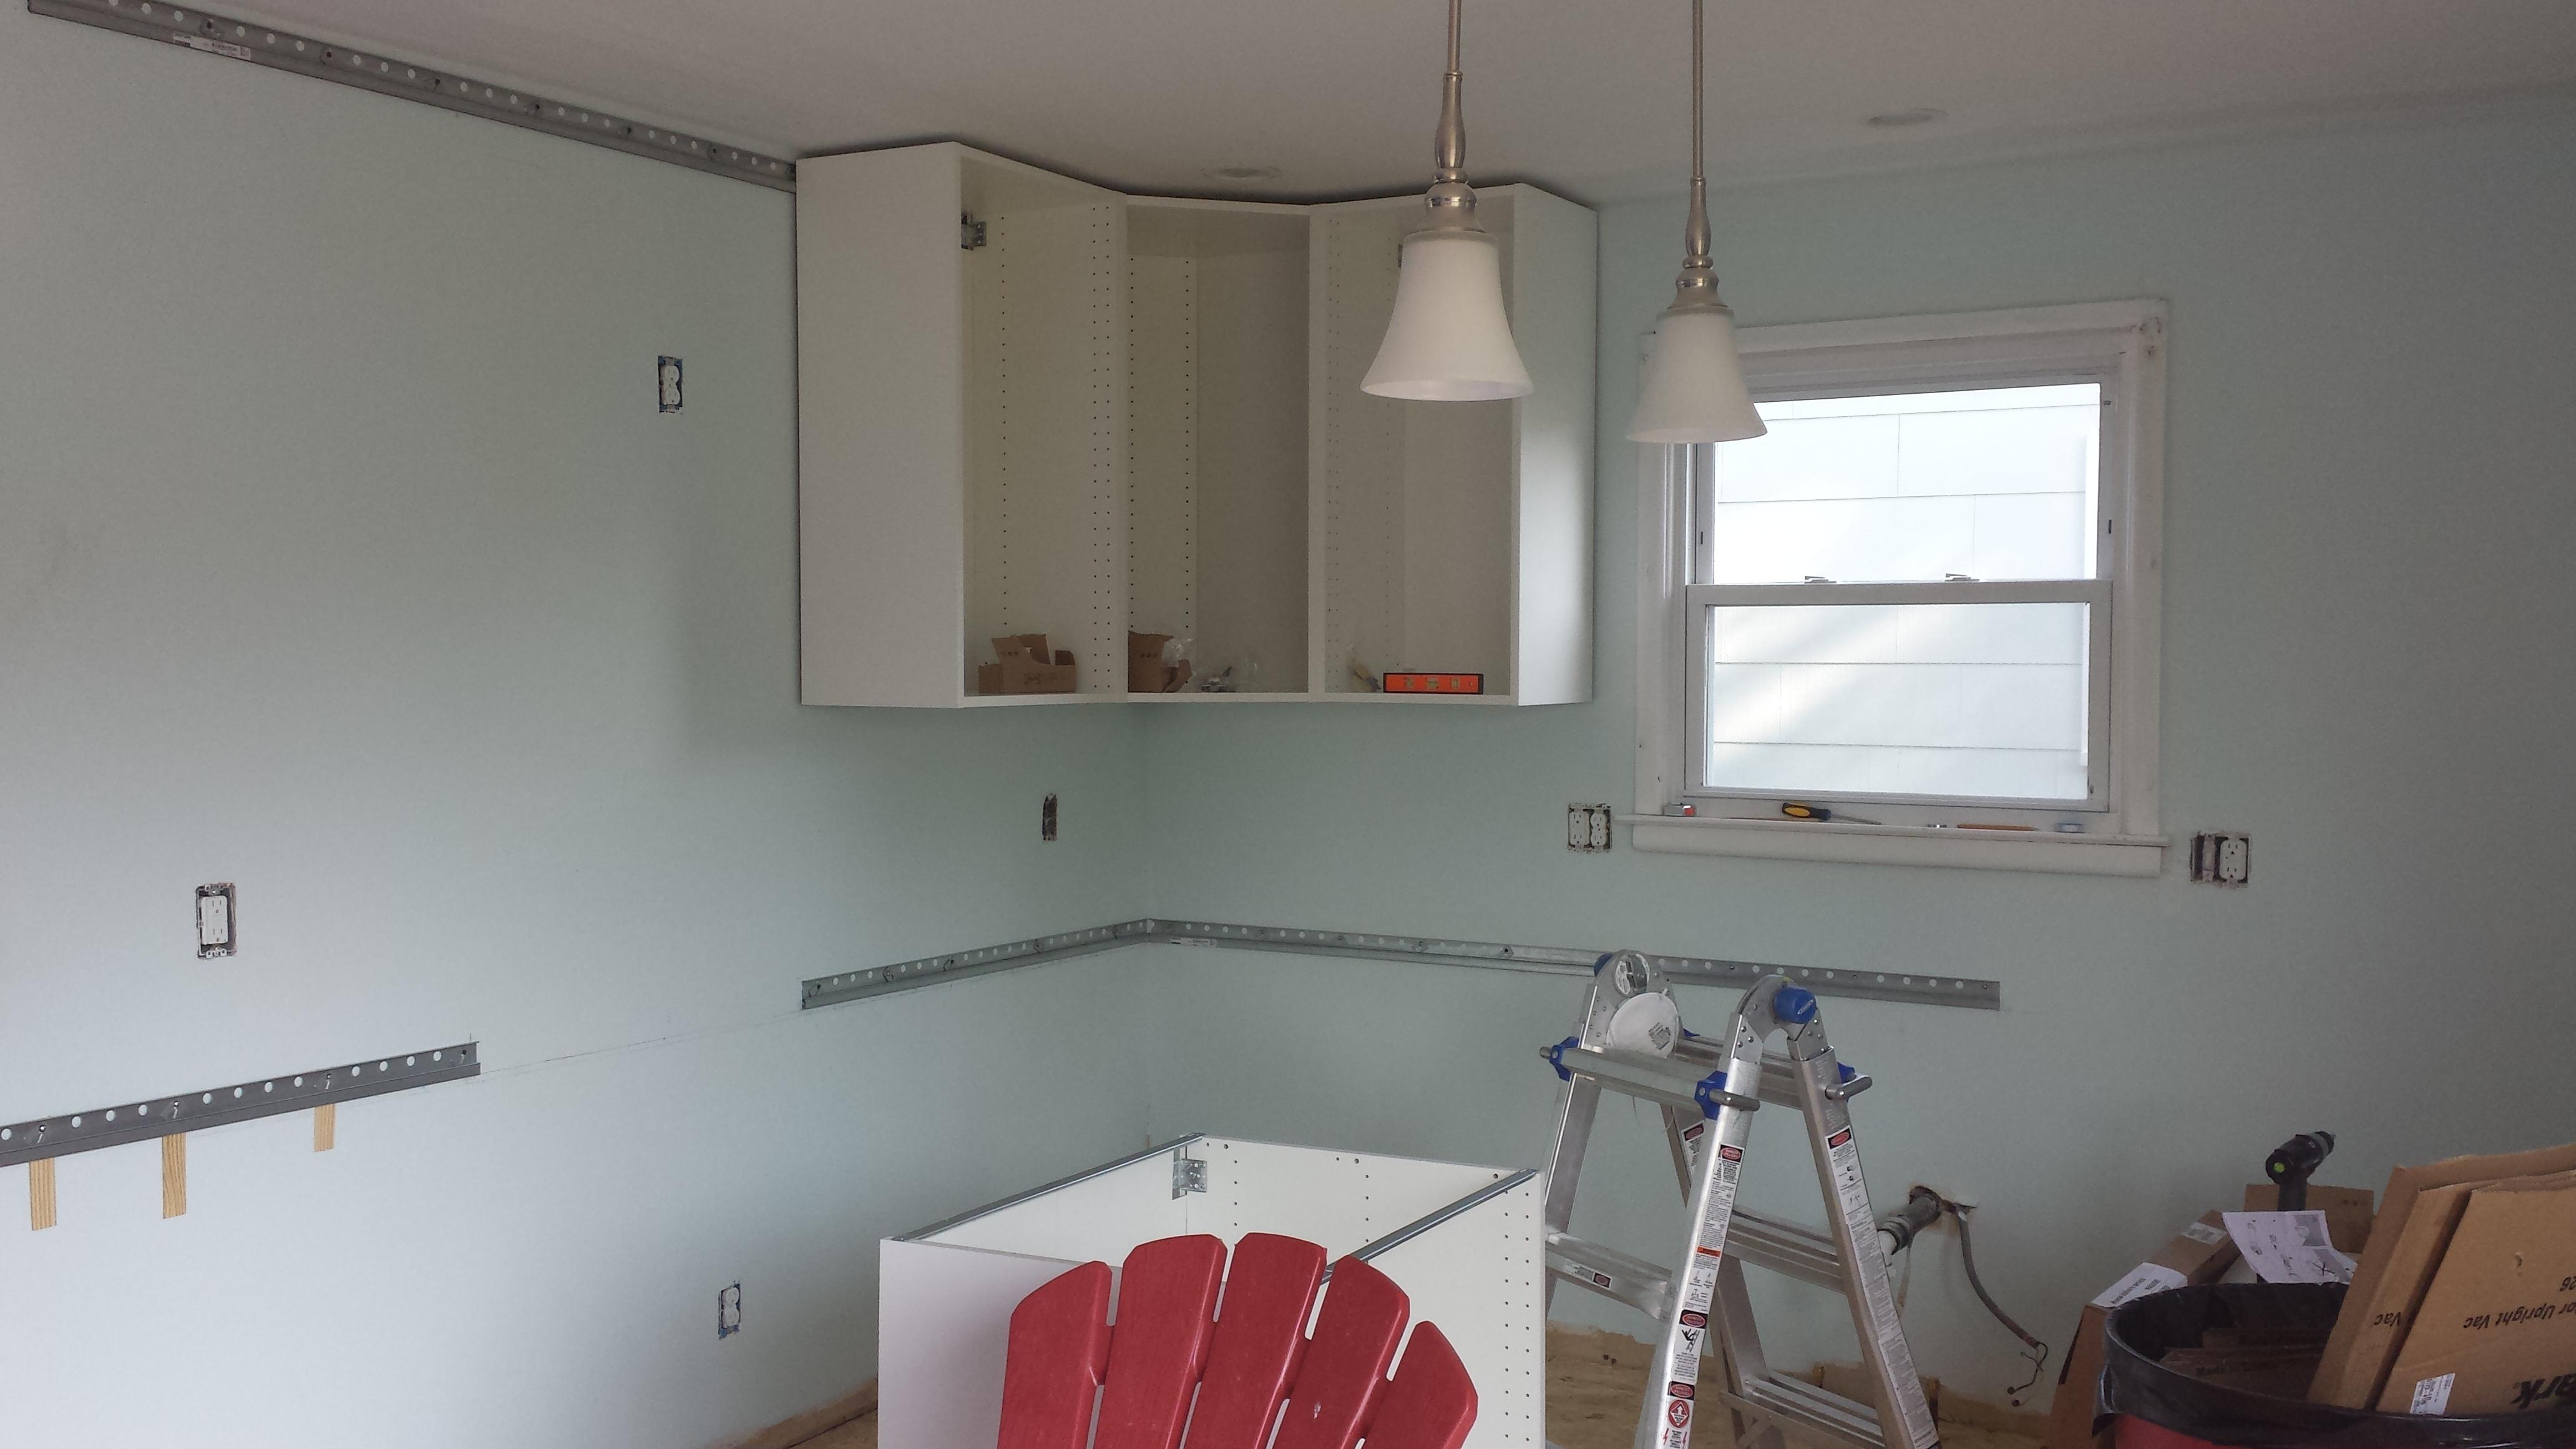 Cabinet Installation Round 2: Hanging Ikea Cabinets